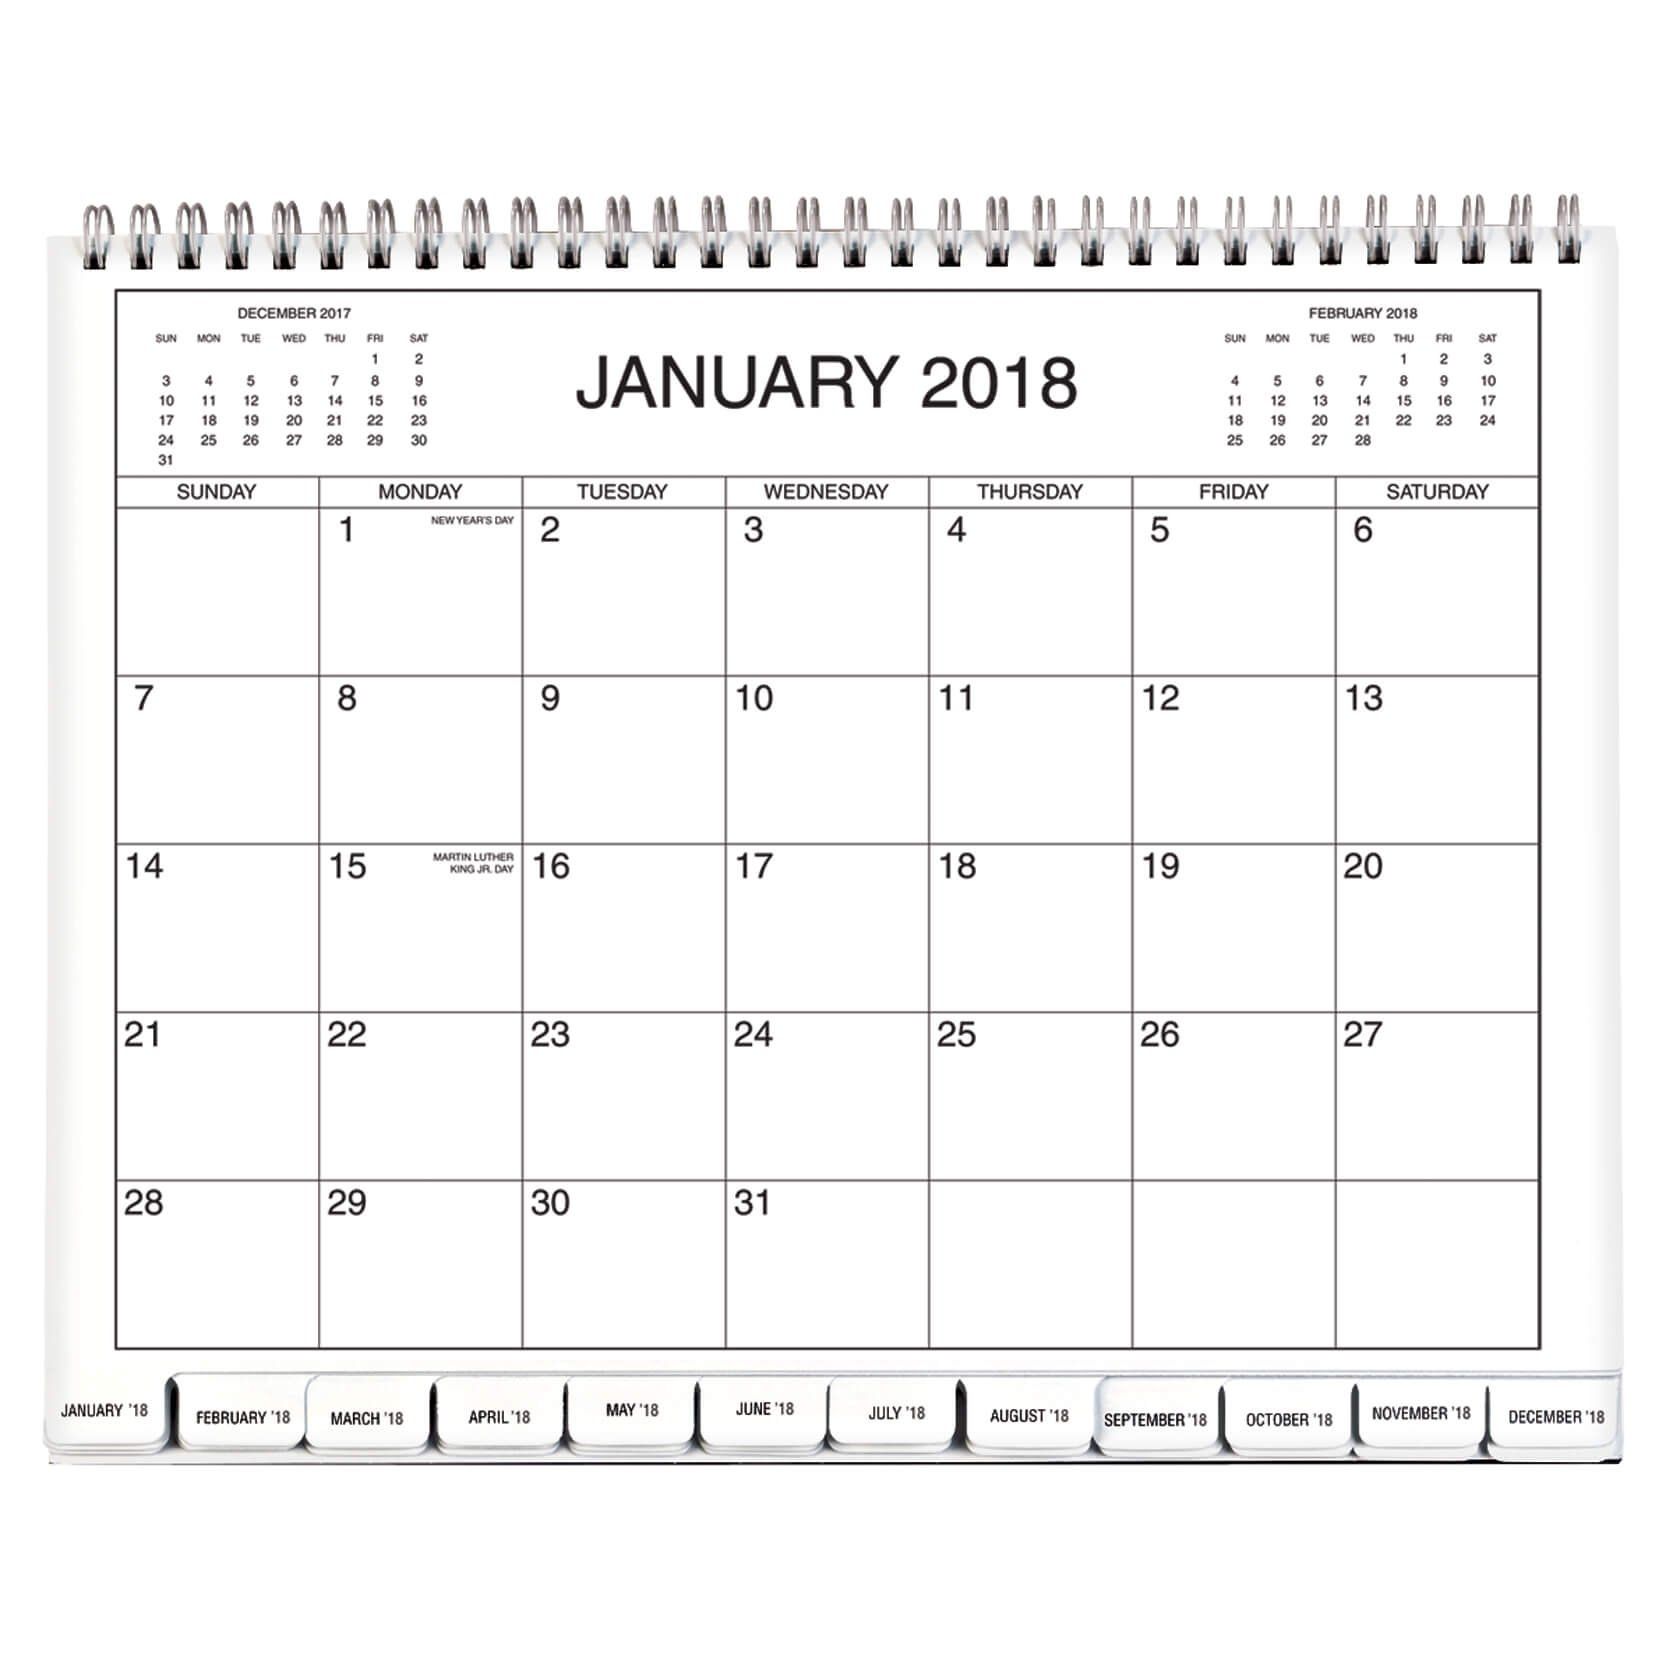 5 Year Calendar 2018 2019 2020 2021 2022 – Monthly Calendar – Walter 5 Year Calendar 2019 To 2023